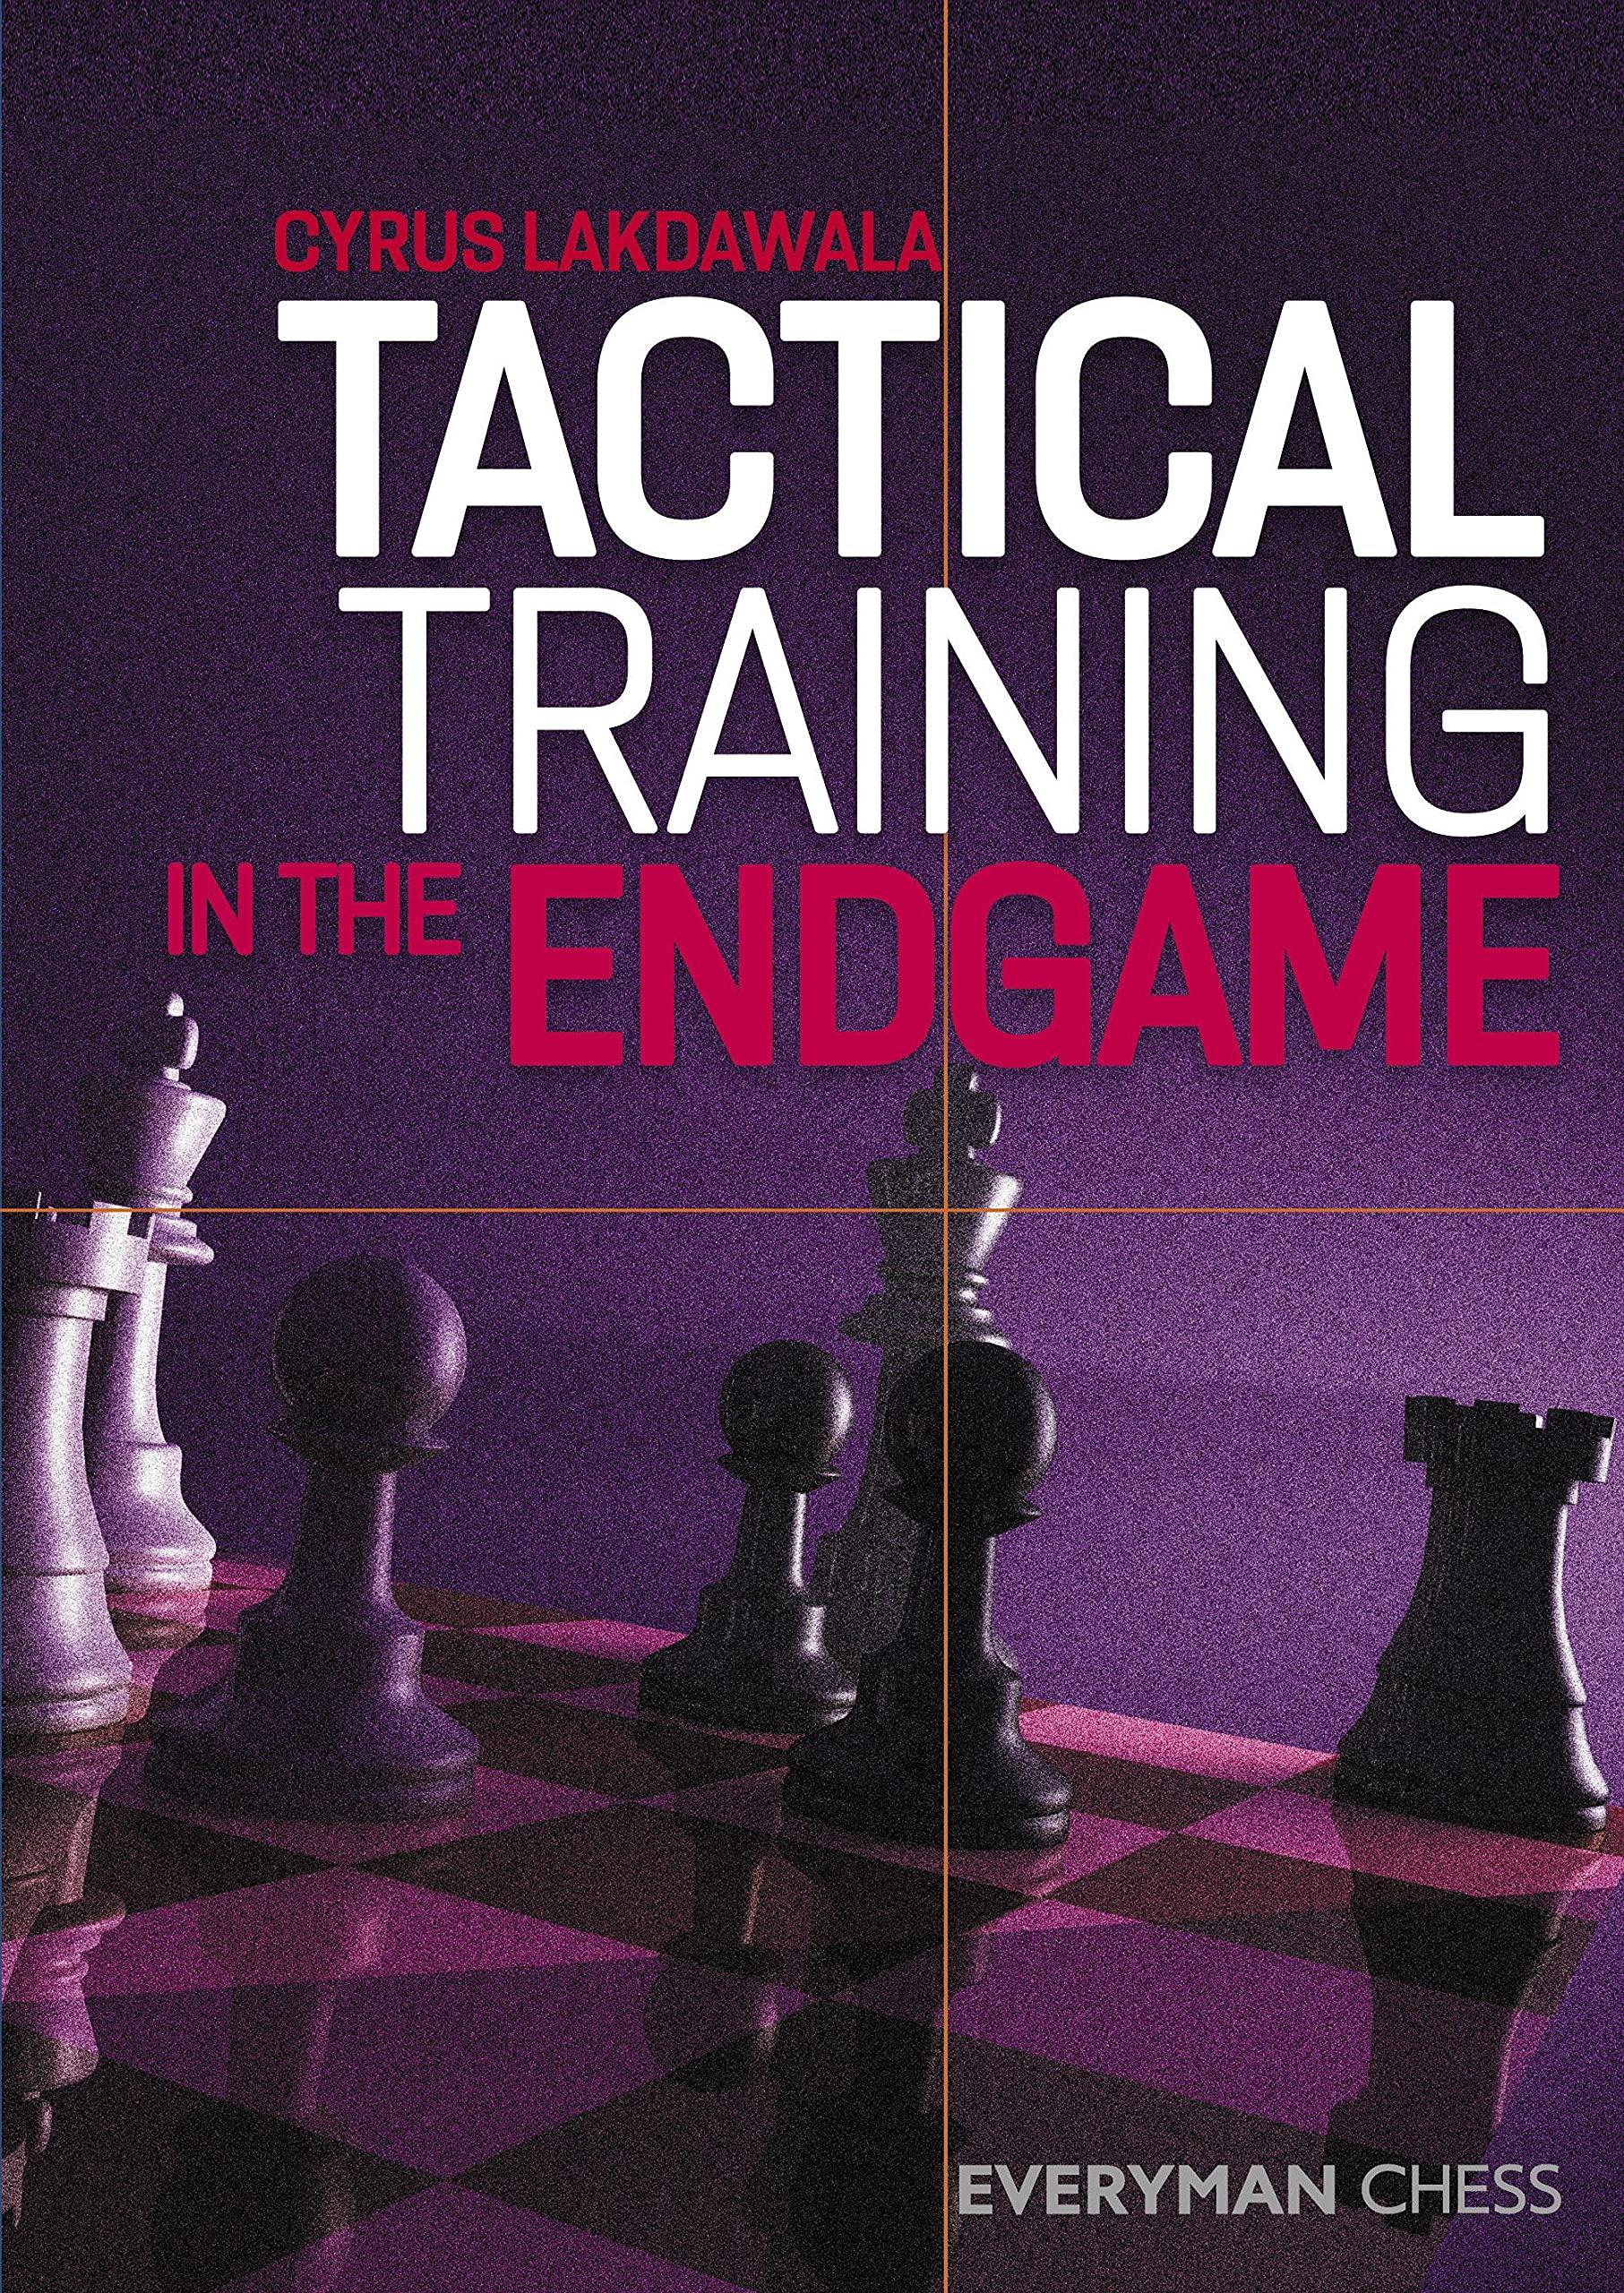 Tactical Training in the Endgame, Cyrus Lakdawala, everyman Chess, Cyrus Lakdawala, 23rd July 2021, ISBN-13  :  978-1781945865